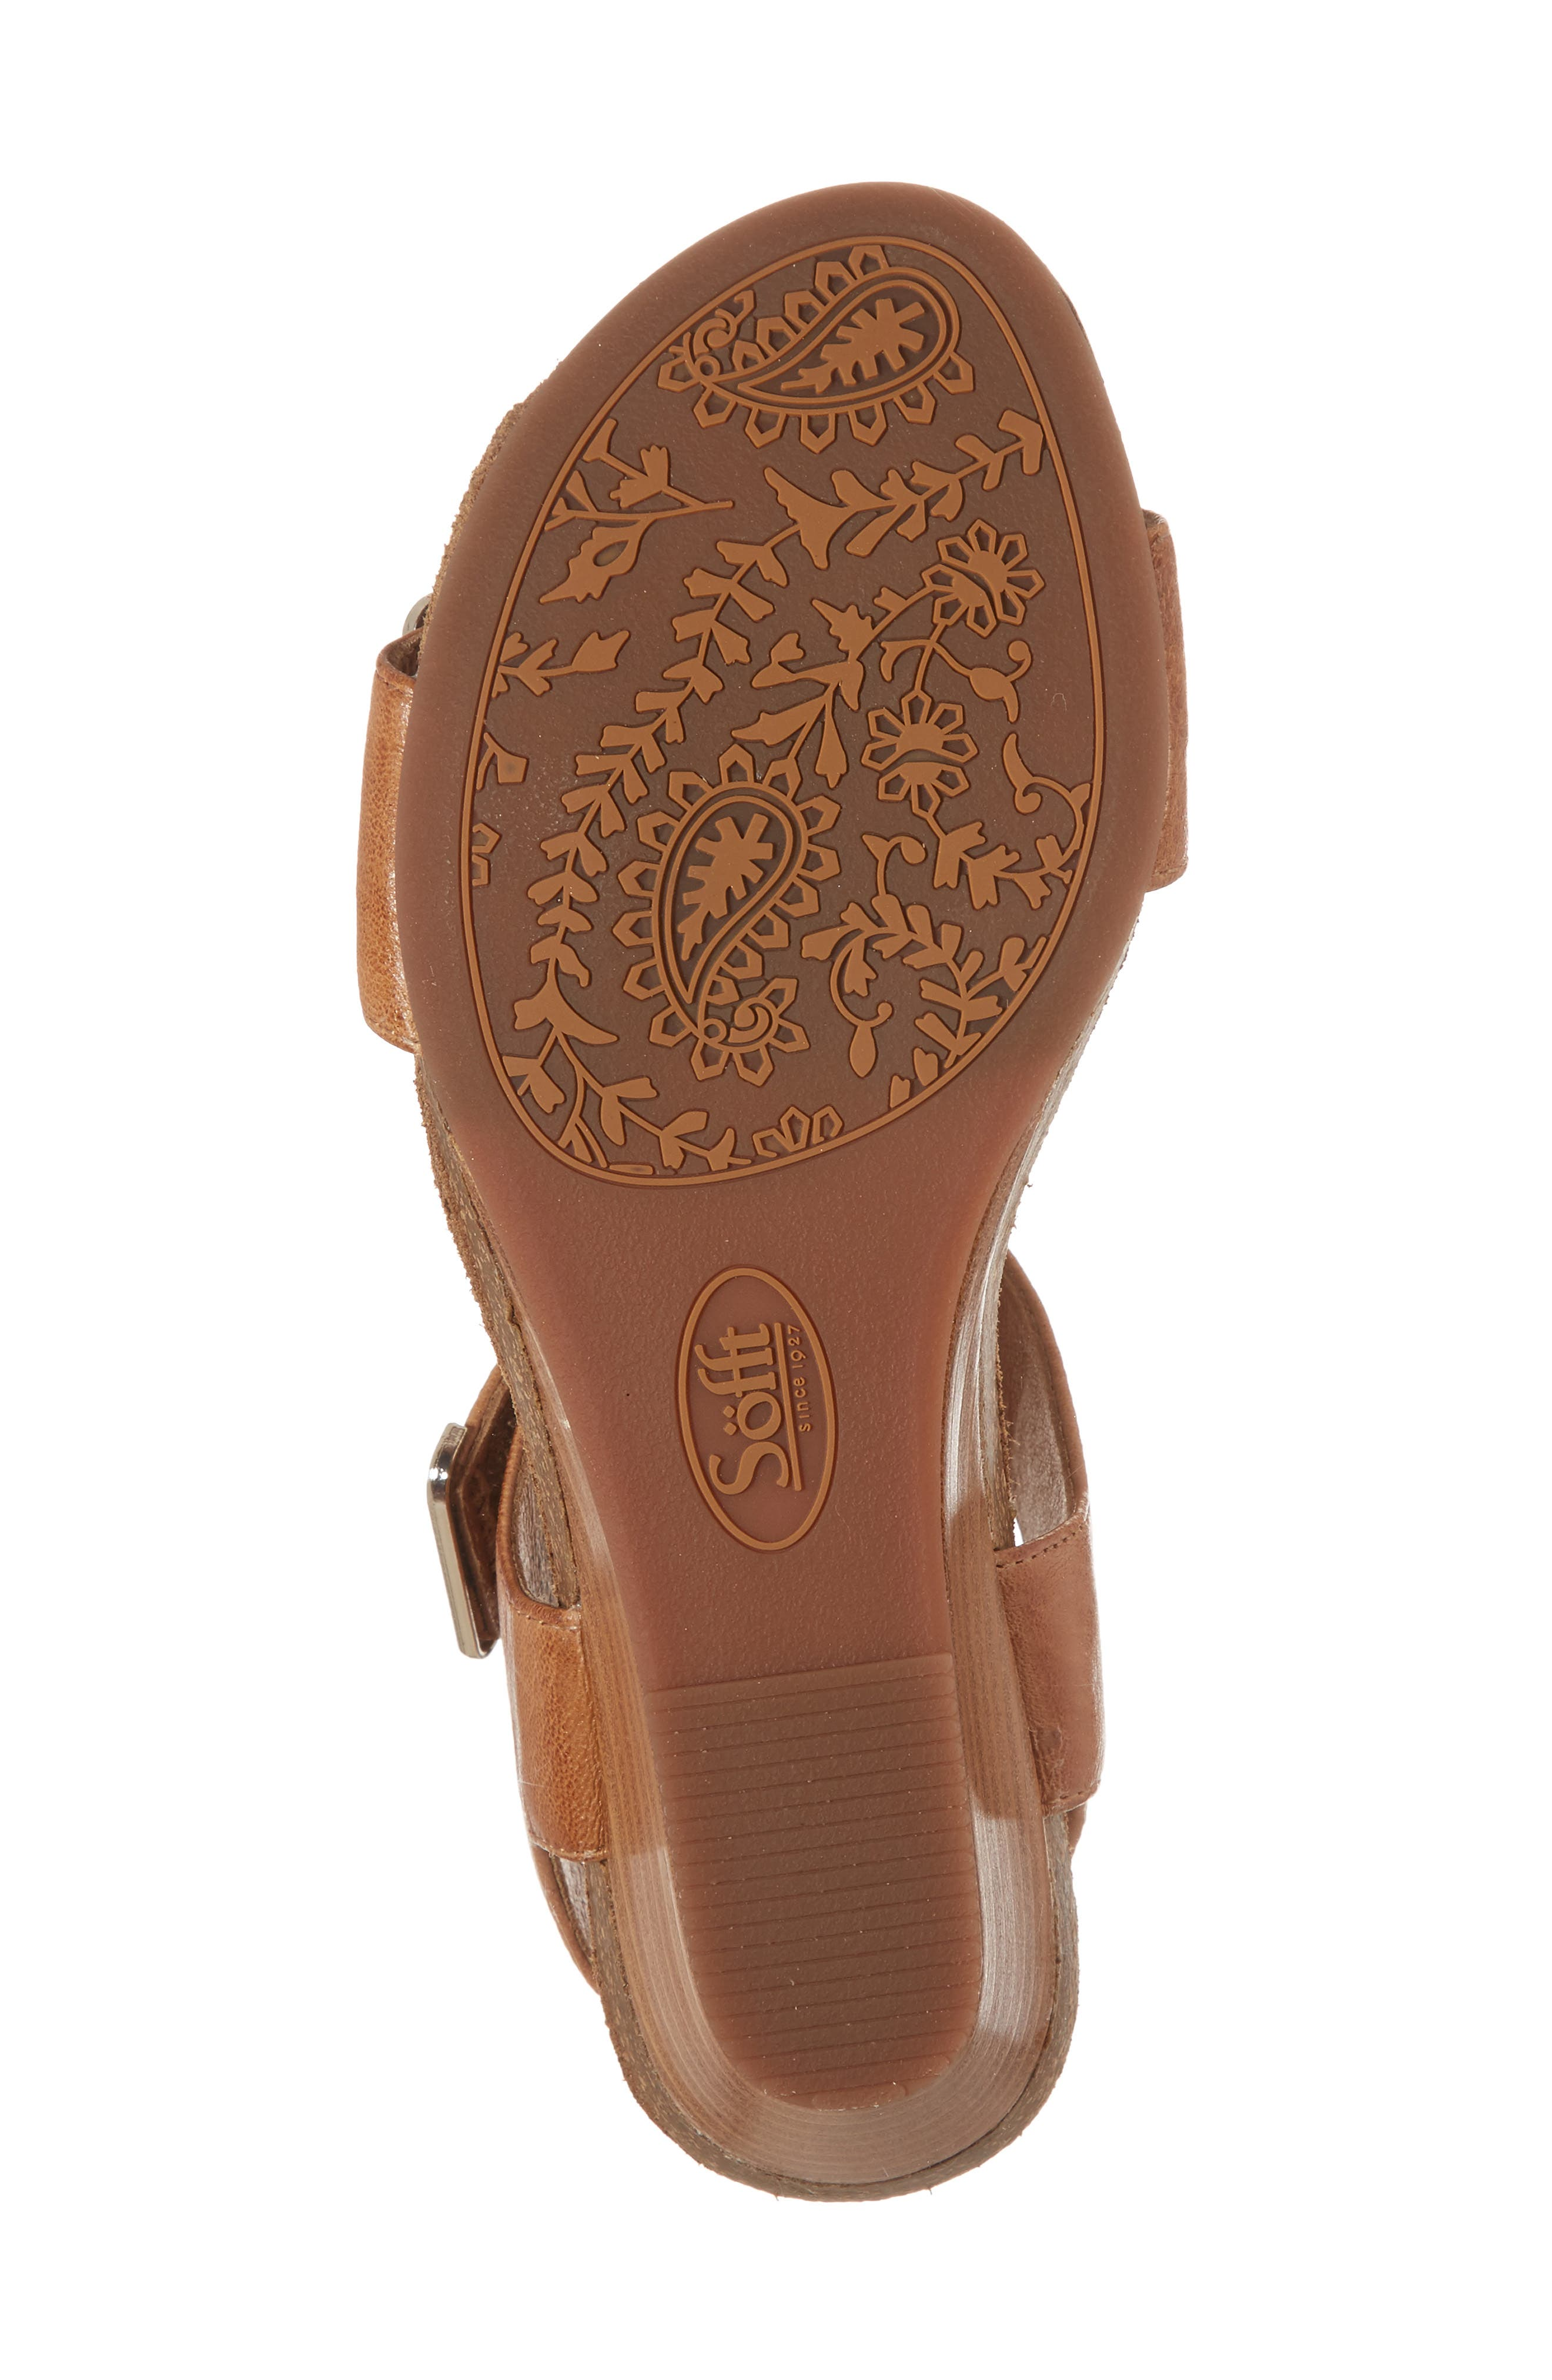 Verdi Wedge Sandal,                             Alternate thumbnail 6, color,                             Luggage Leather